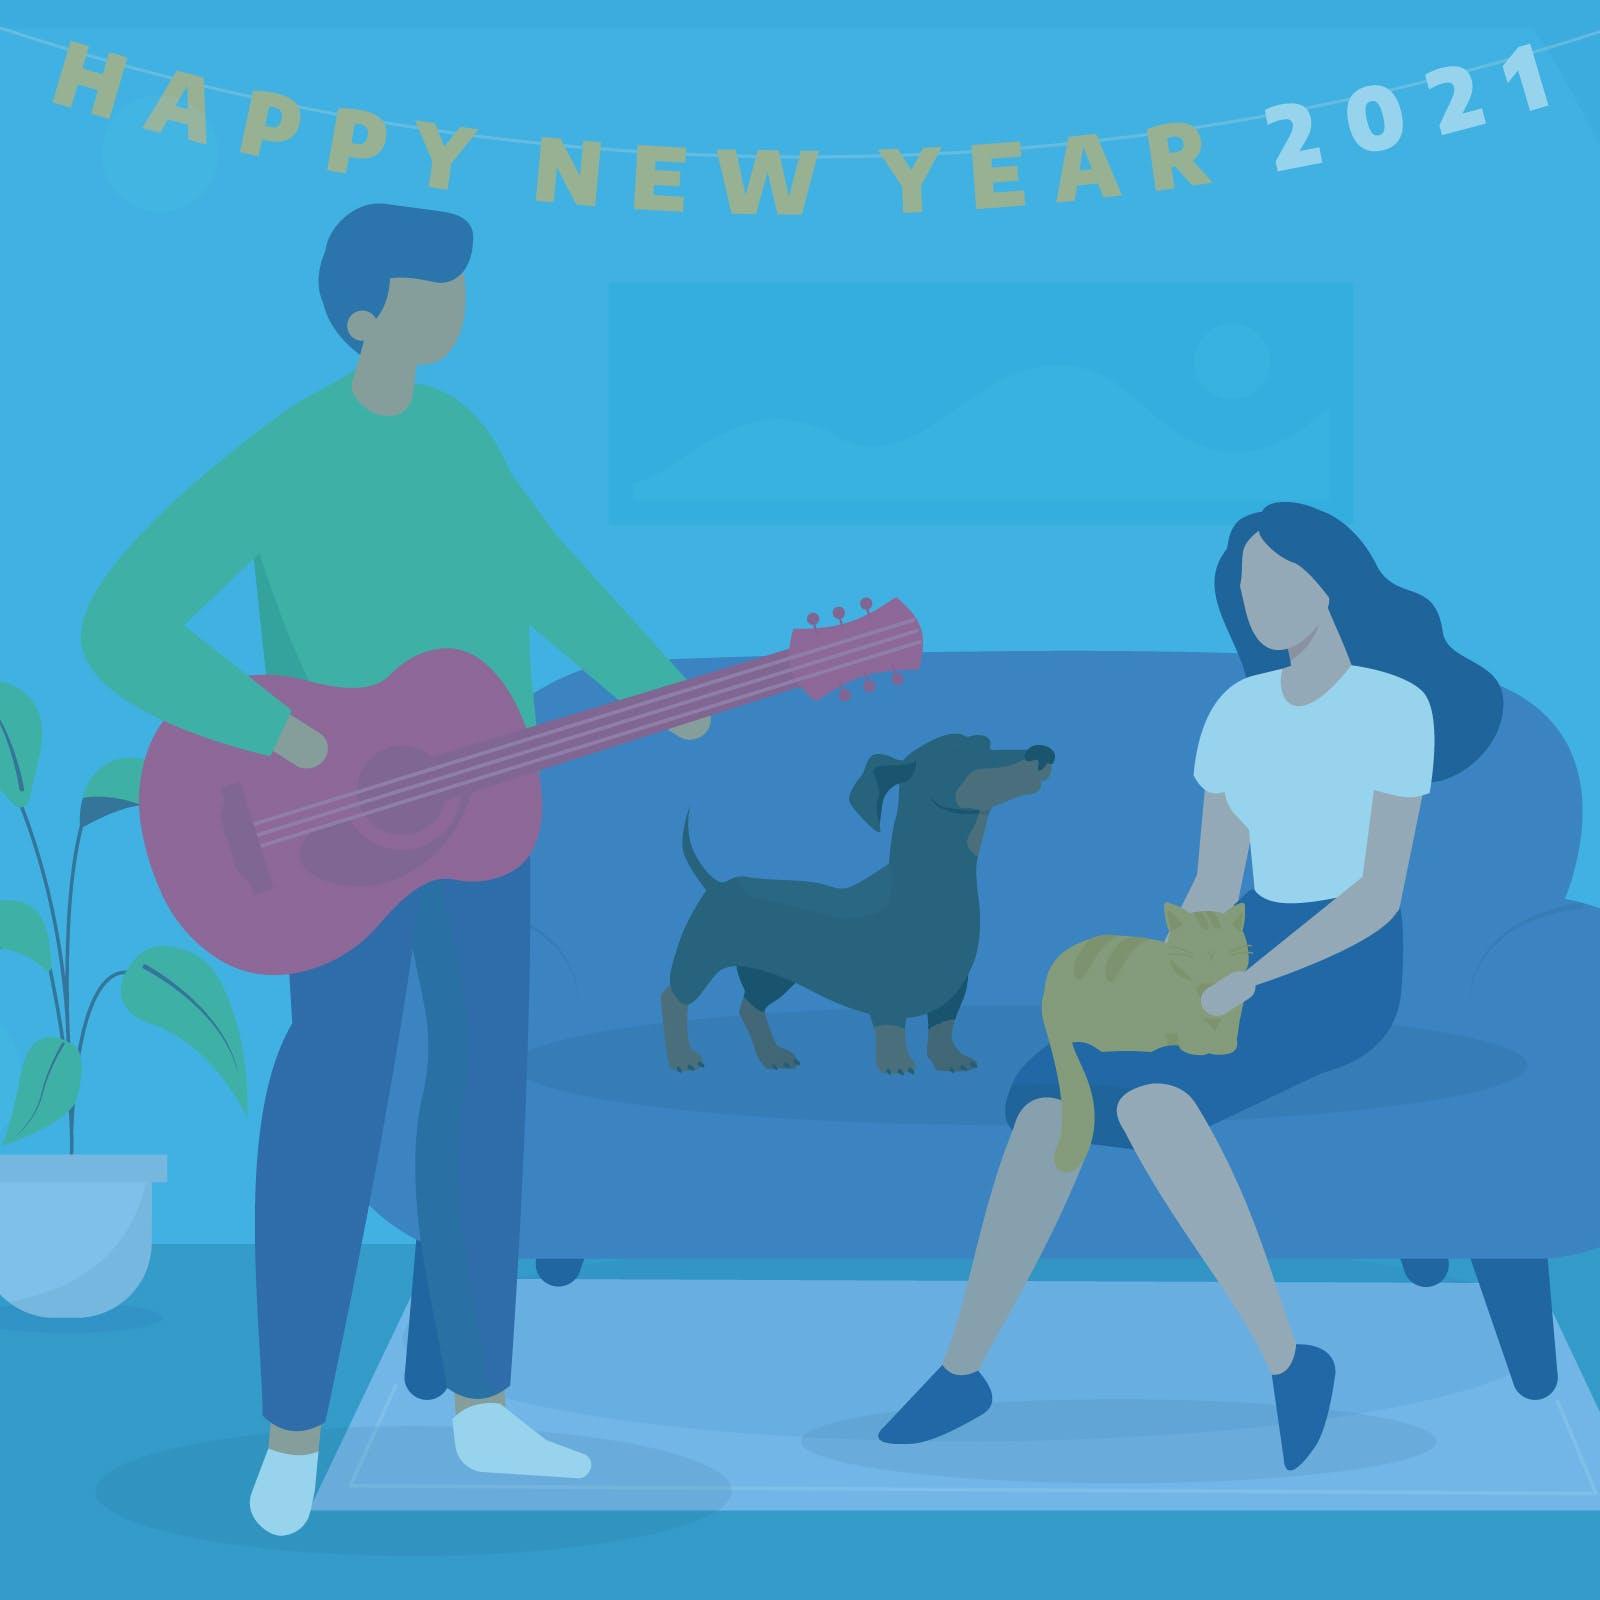 2021 New Year graphic